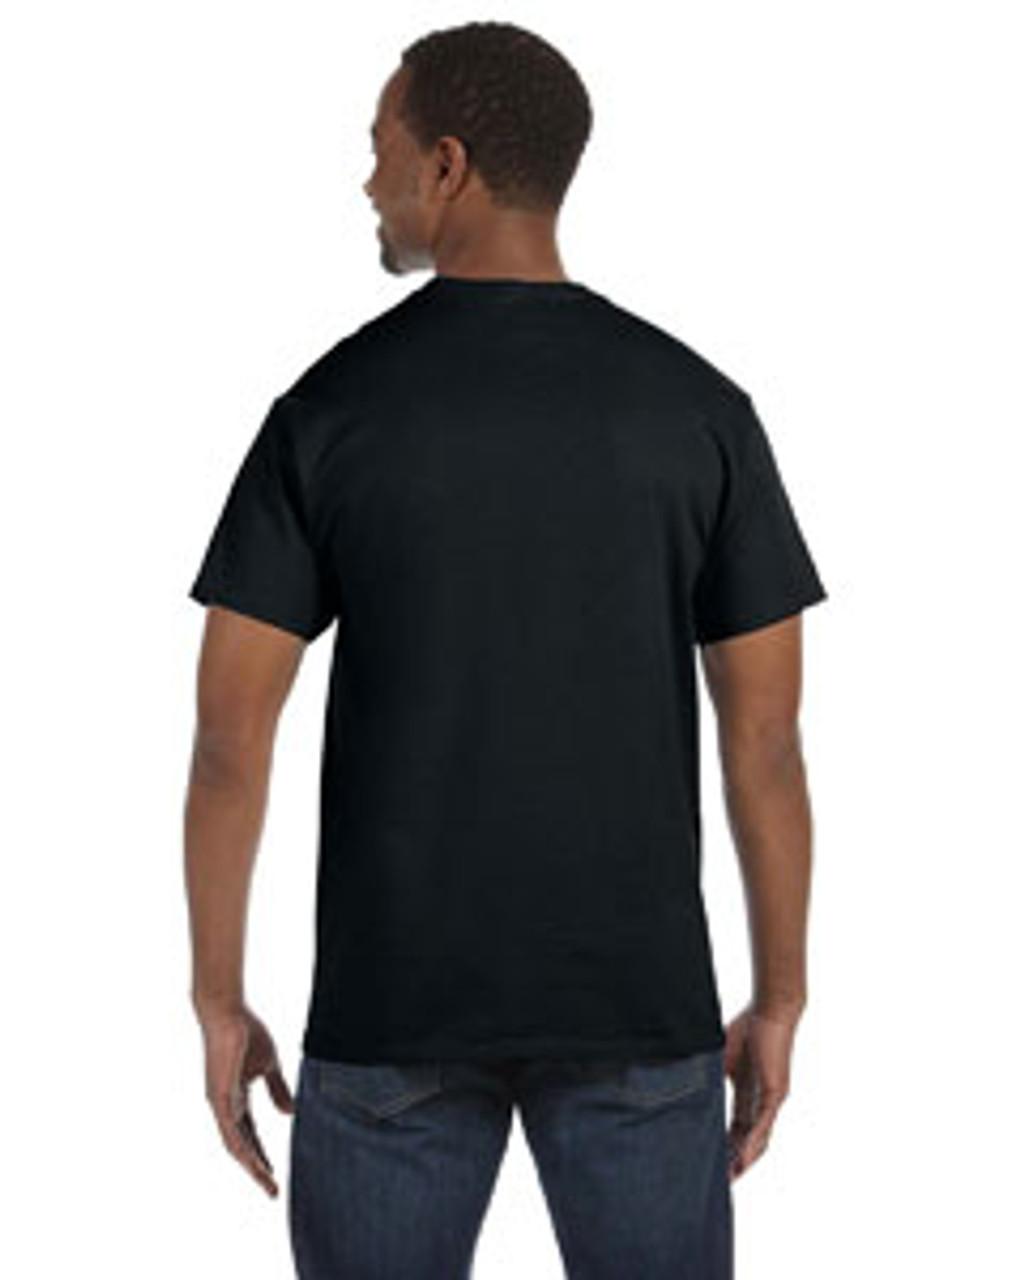 34ec474b307d Blank Next to Perfect T-shirts | Slight irregular T-shirts | Graded ...